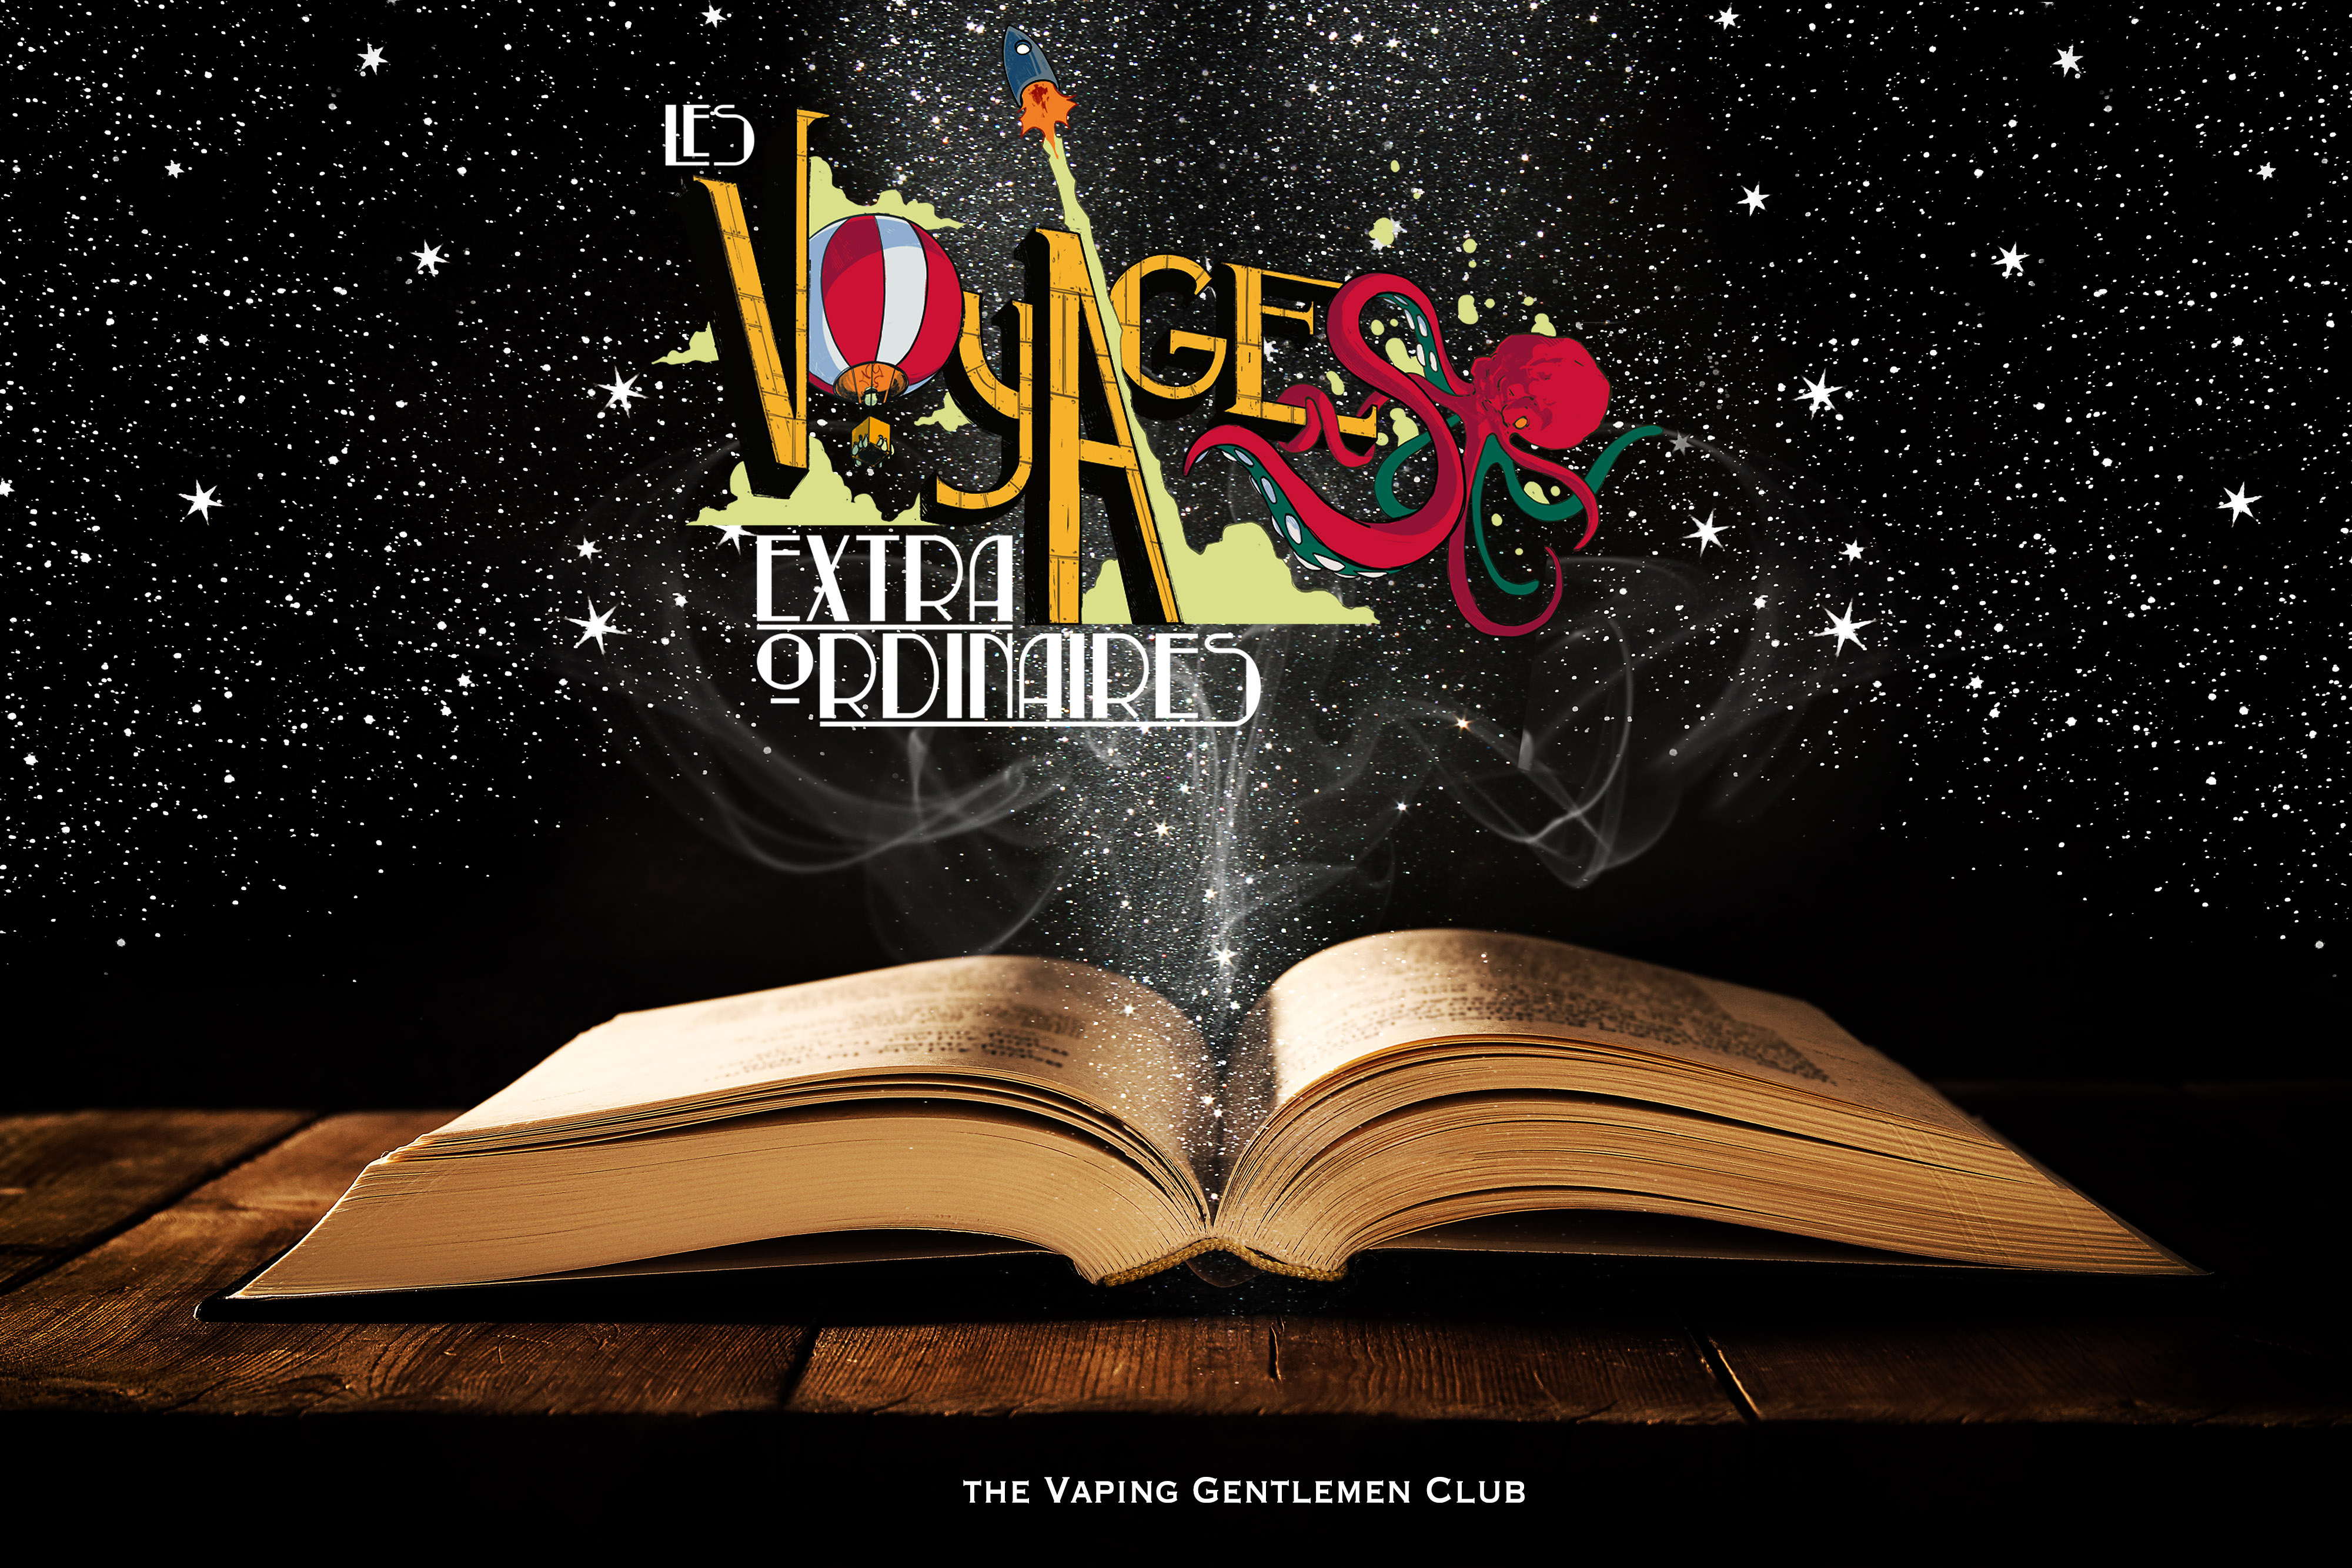 The Vaping Gentlemen Club Voyages